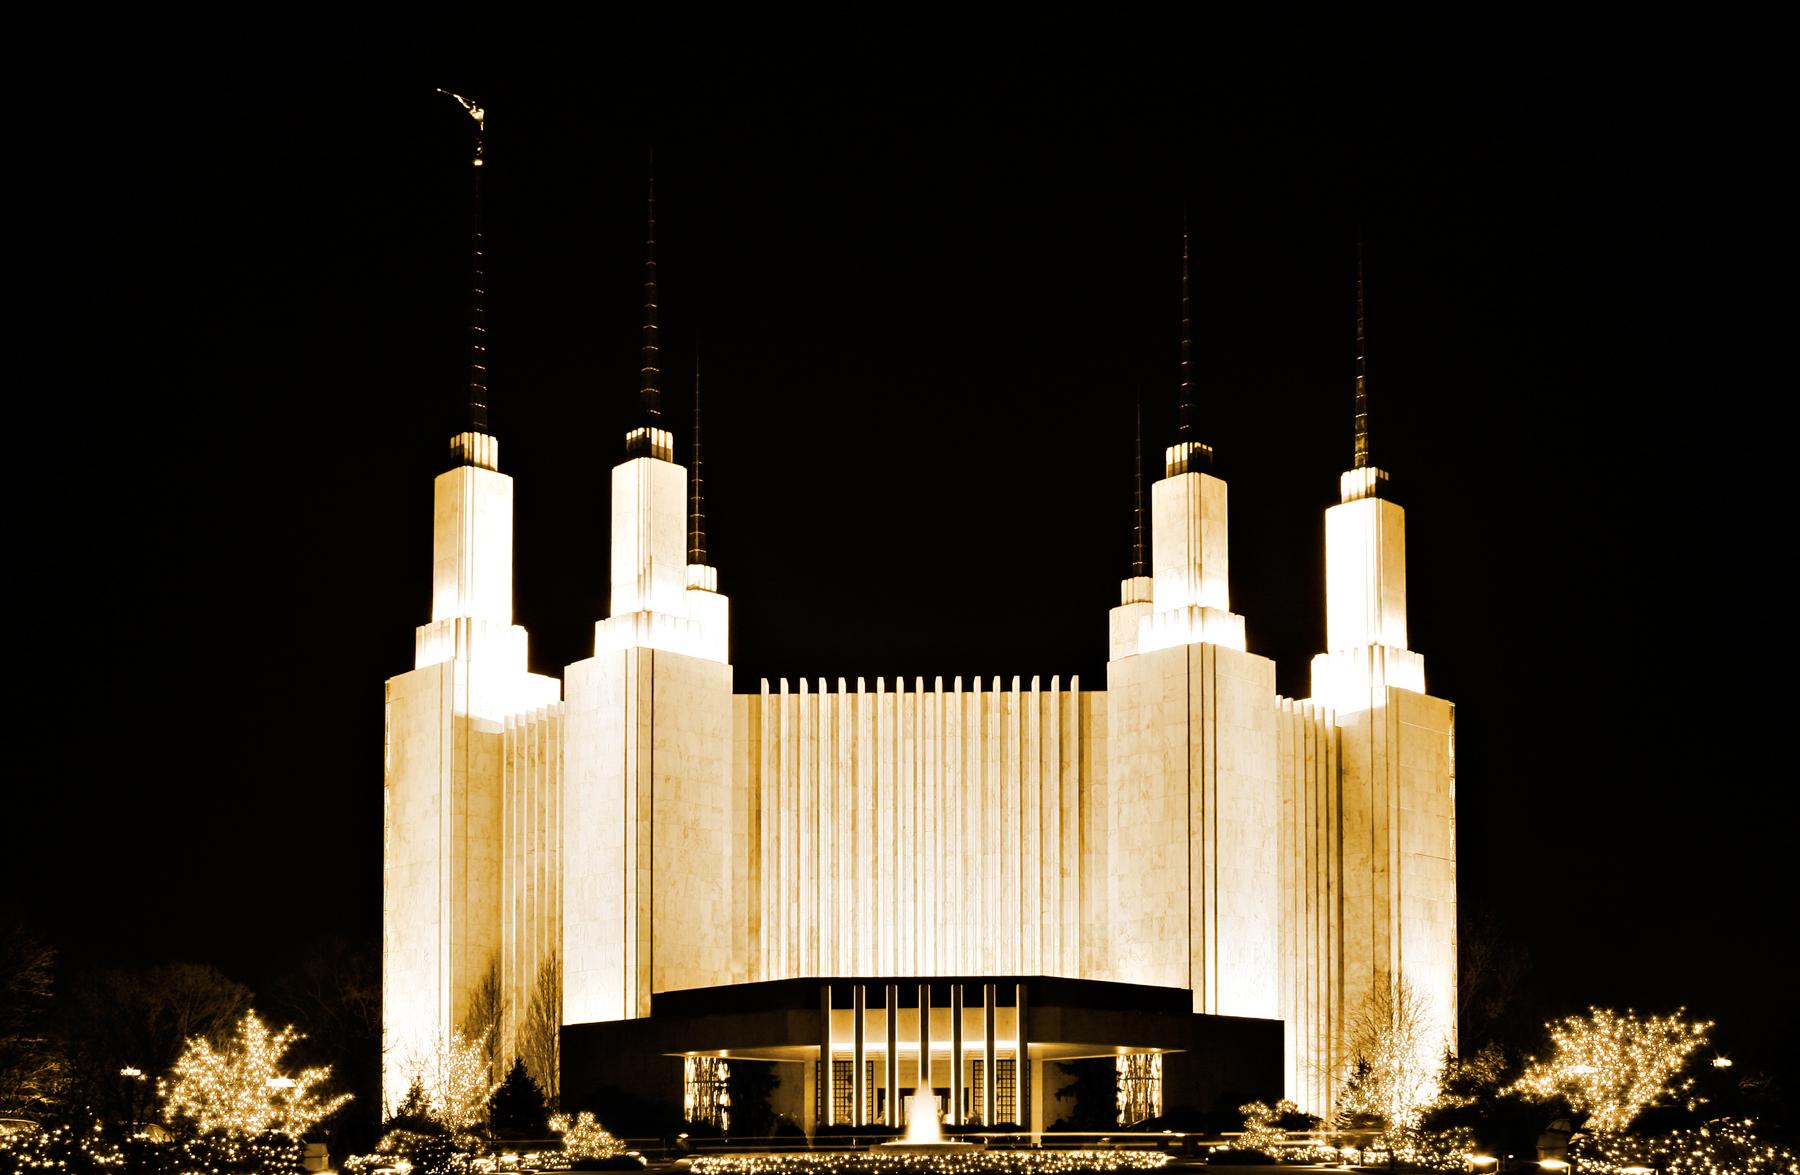 Mormon Temple, America, Somadjinn, Night, Photo, HQ Photo